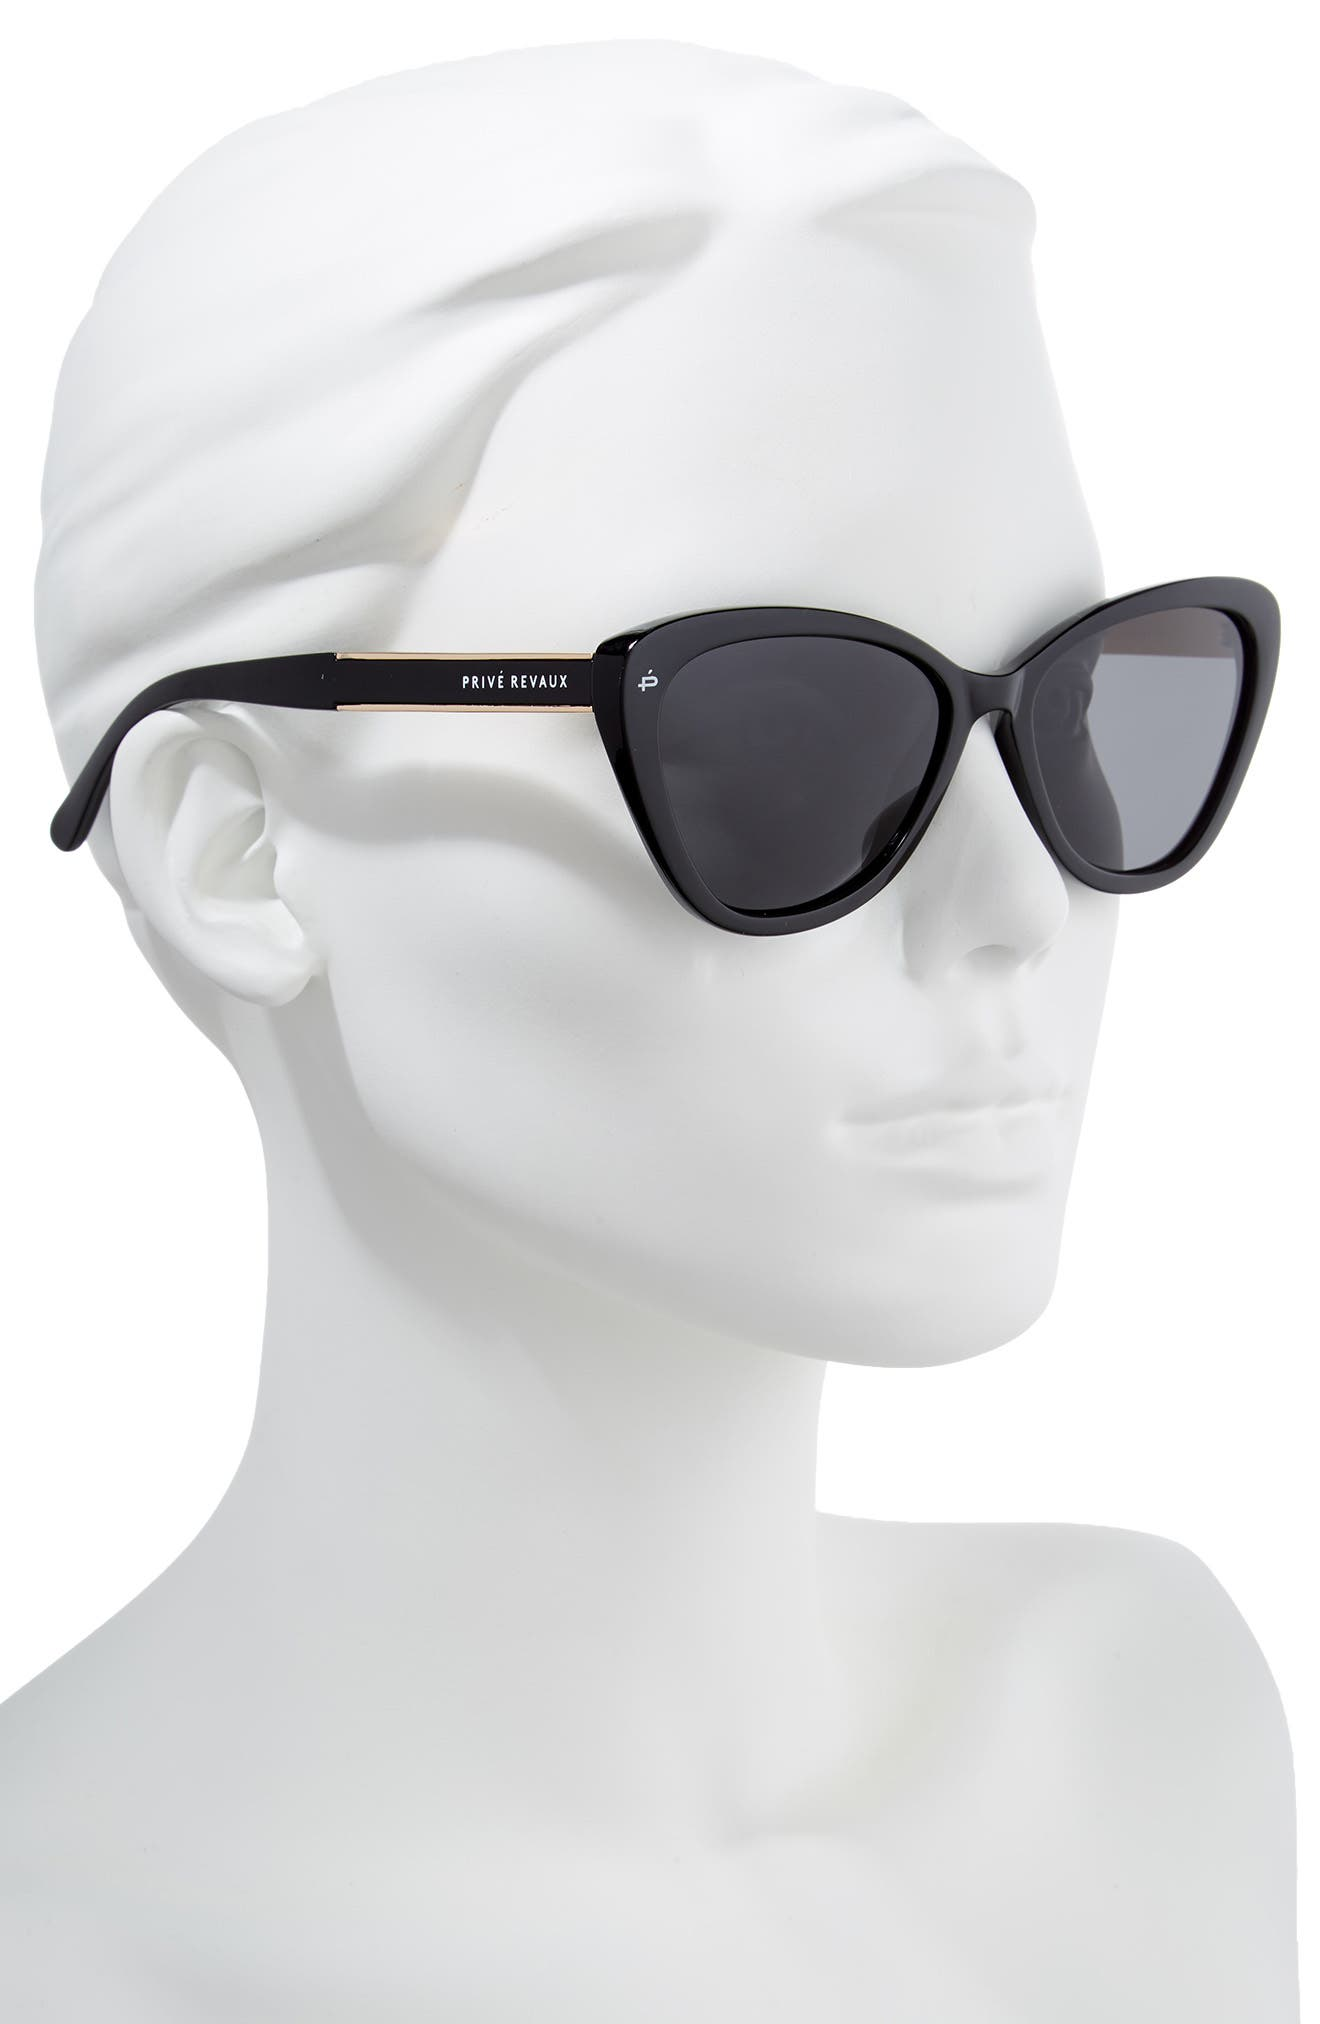 Privé Revaux The Hepburn 56mm Cat Eye Sunglasses,                             Alternate thumbnail 2, color,                             BLACK